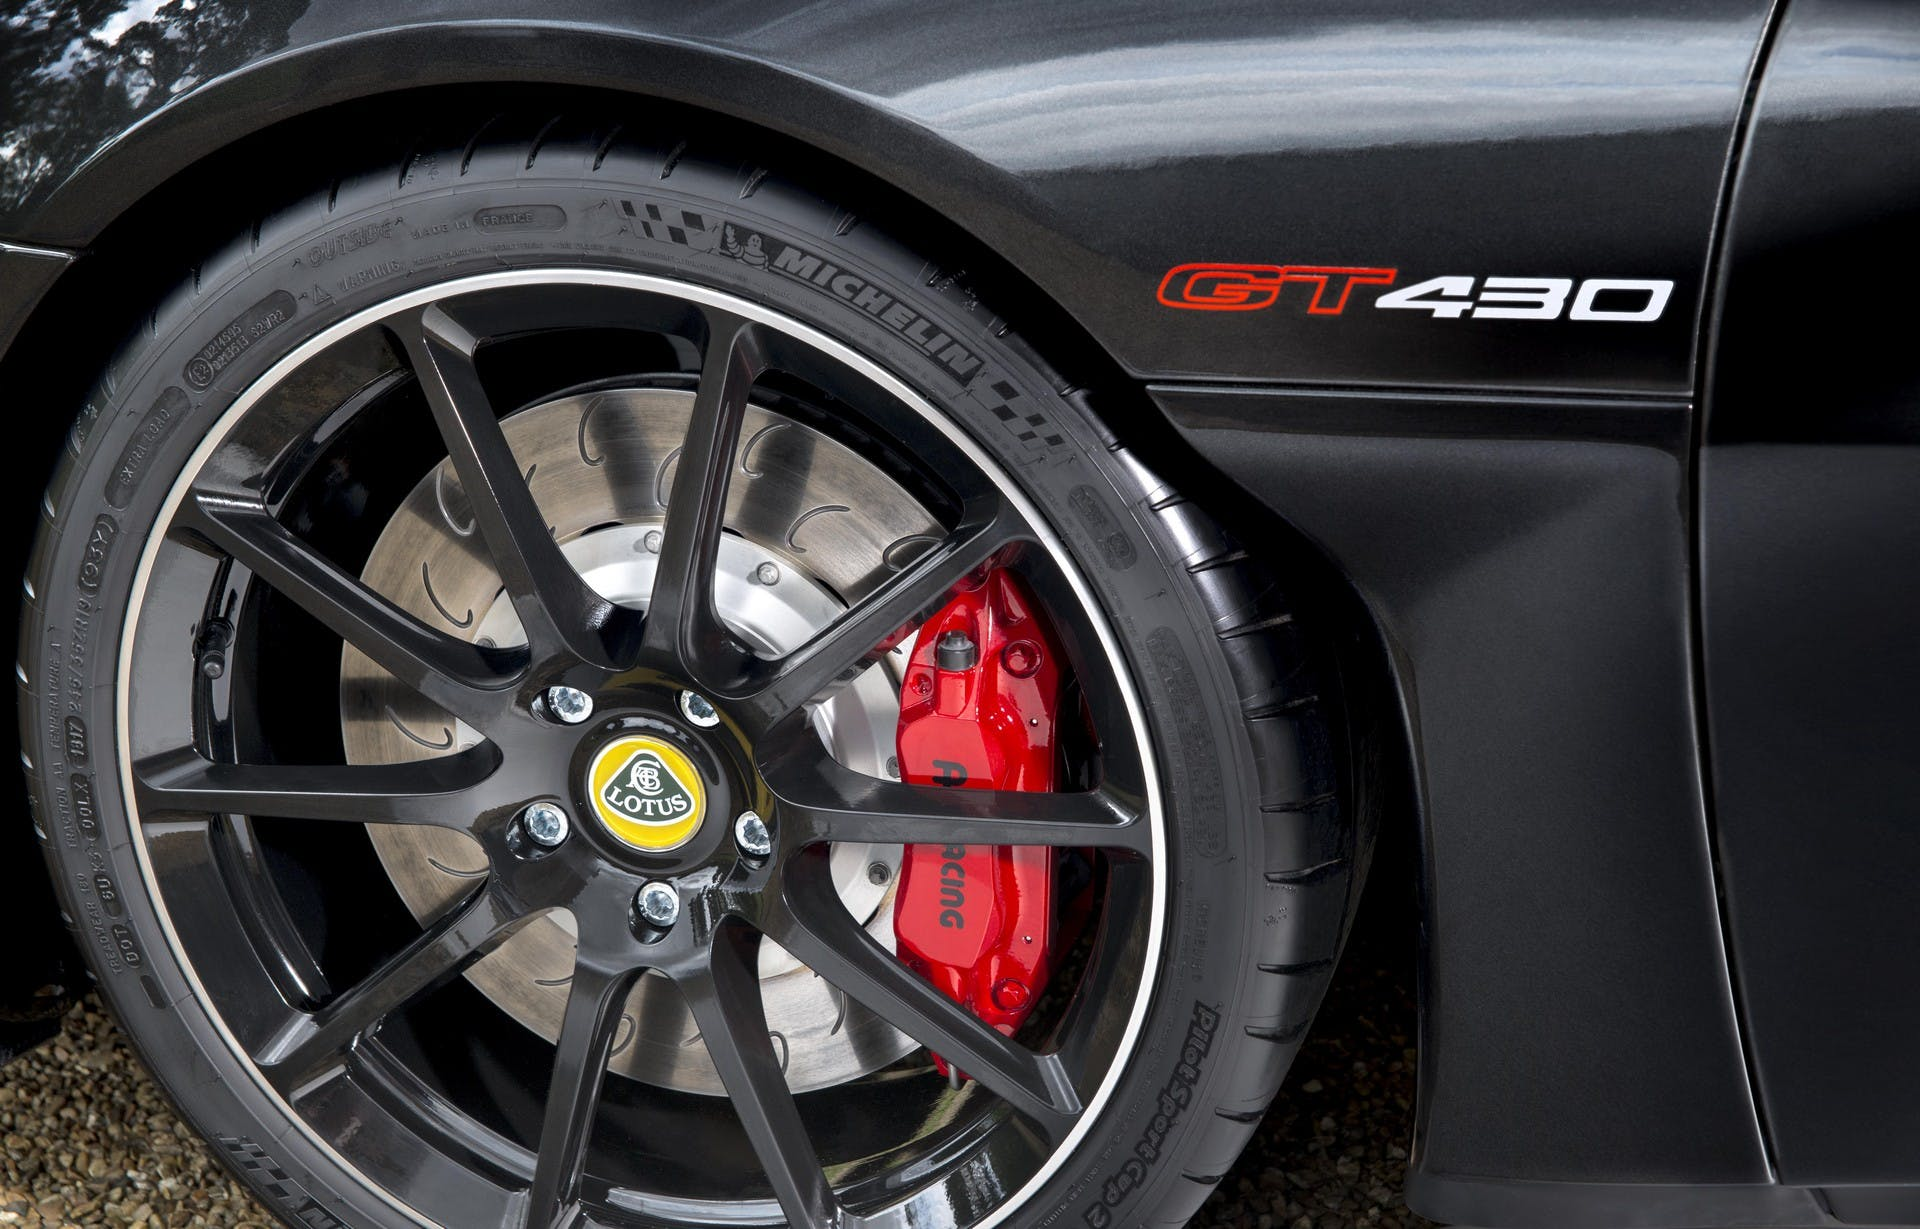 Lotus Evora GT430 dettaglio